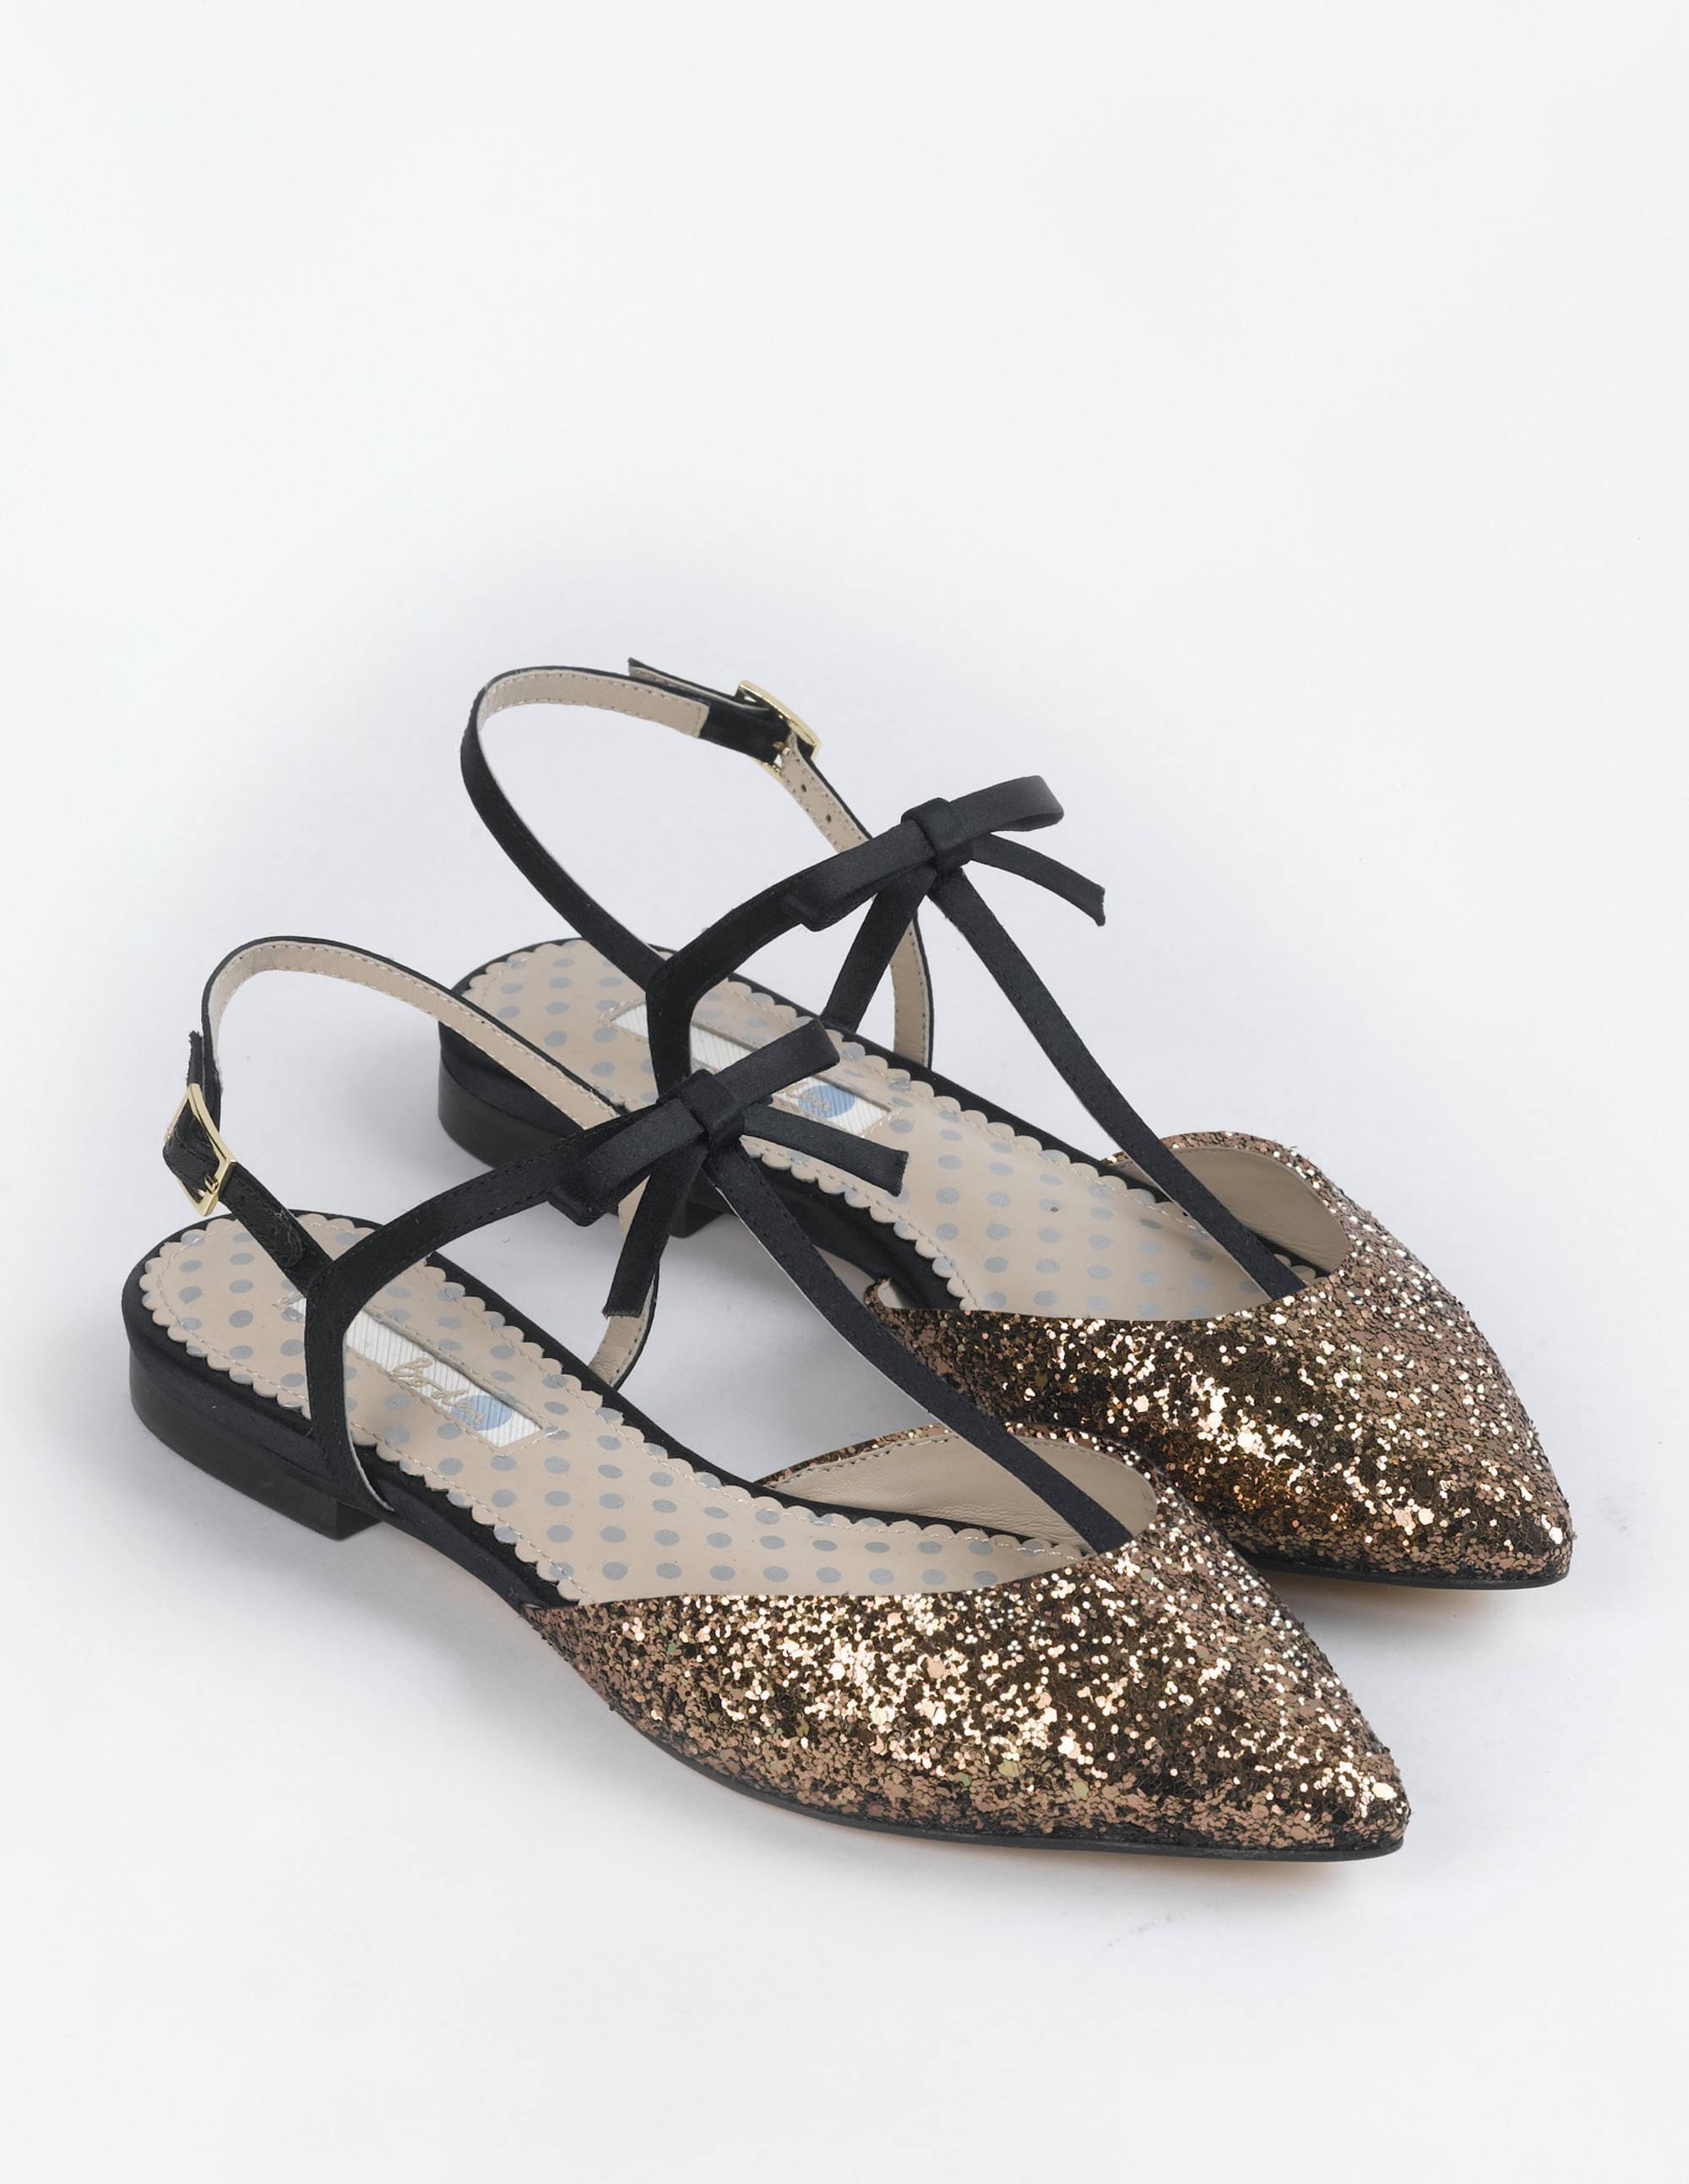 Boden sparkly shoe